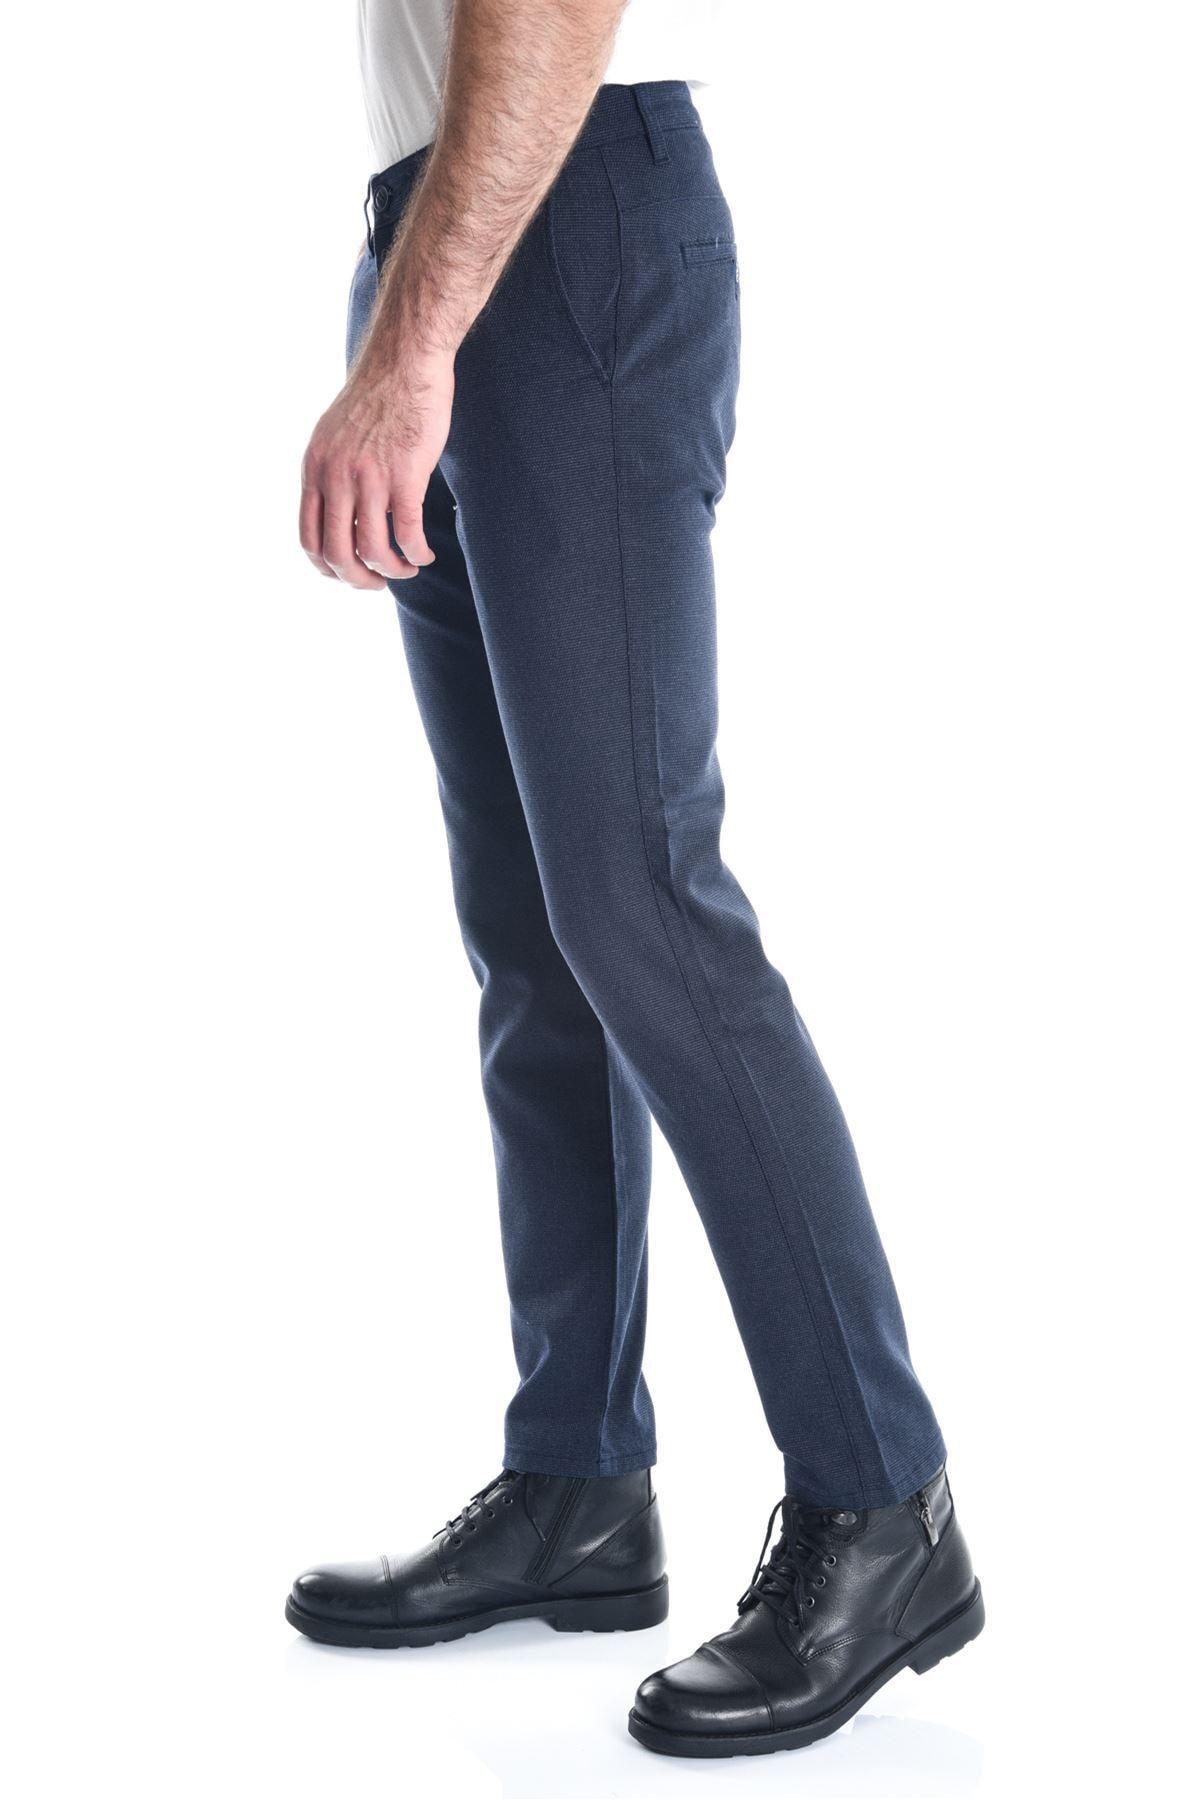 LTC Jeans Lacivert Desenli Armür Chino Erkek Pantolon 1